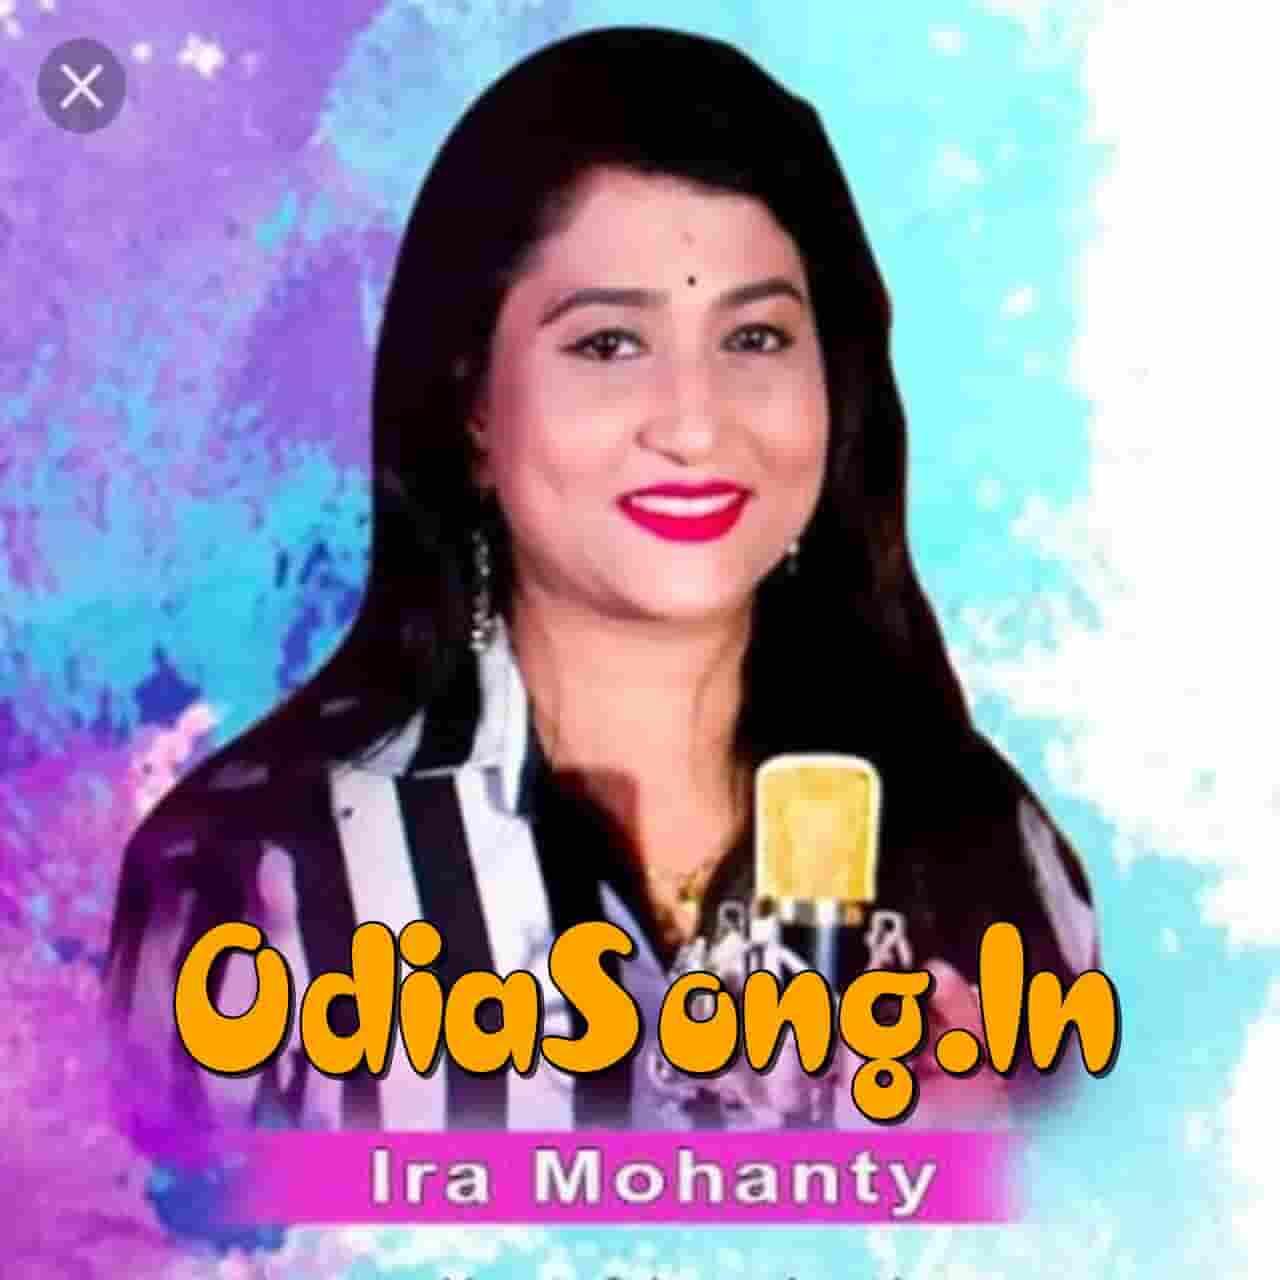 Ratira Bayasa Badhi Badhi Jaye - Ira Mohanty